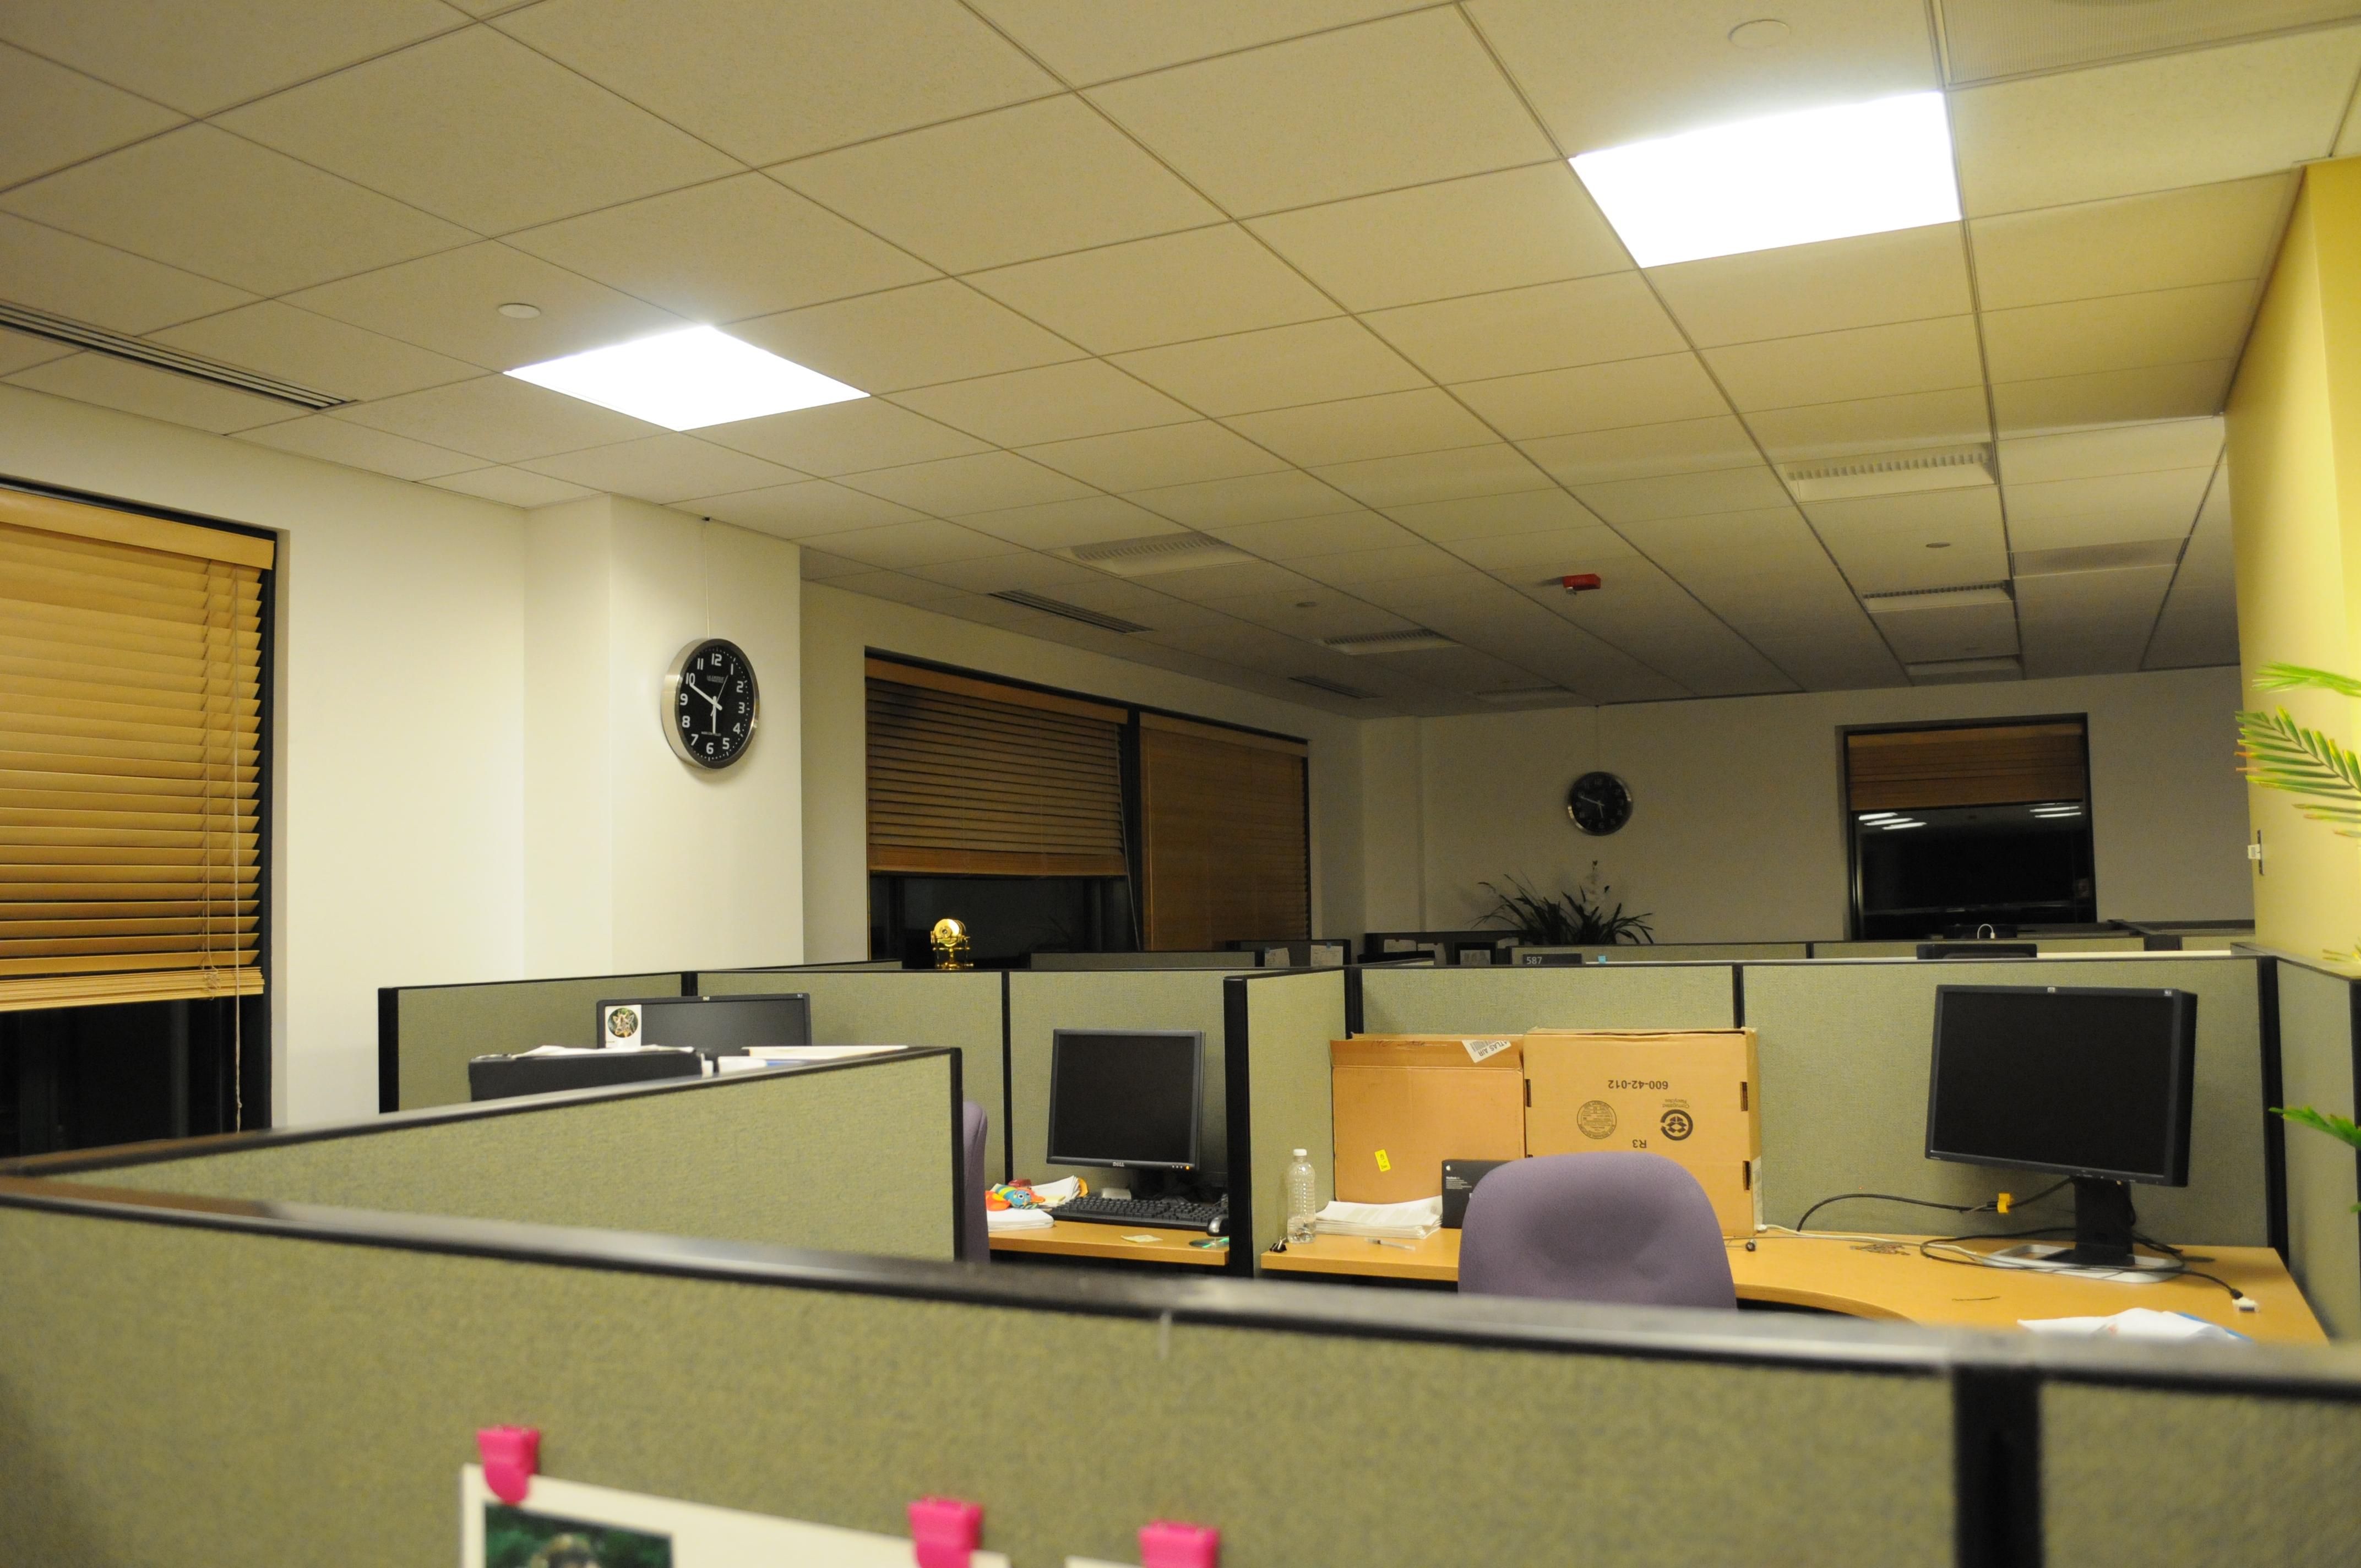 Par Lab at night 2, Hall, Indoor, HQ Photo